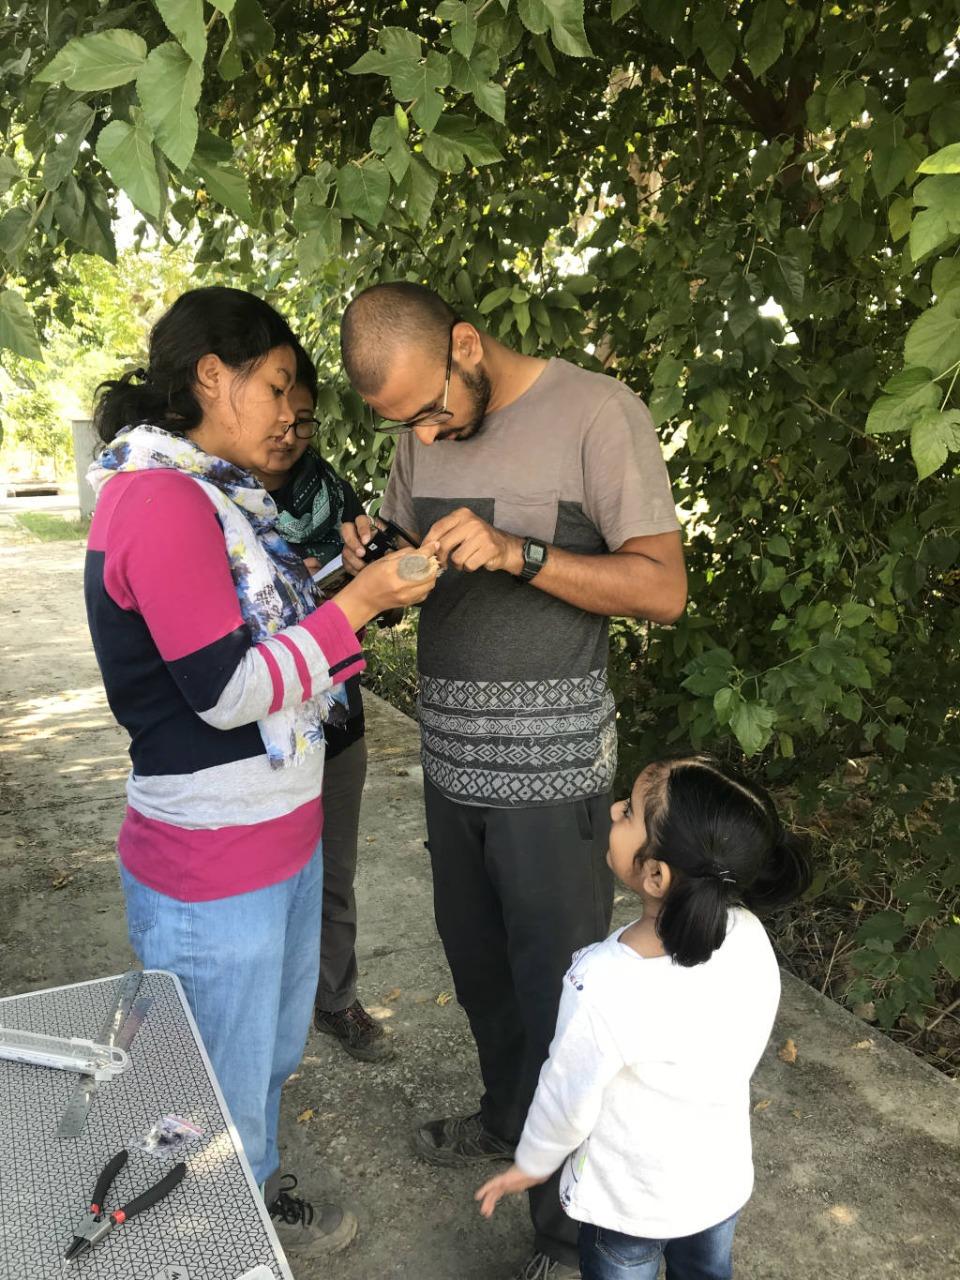 Soniya and Nakul make measurements as Anushka looks on